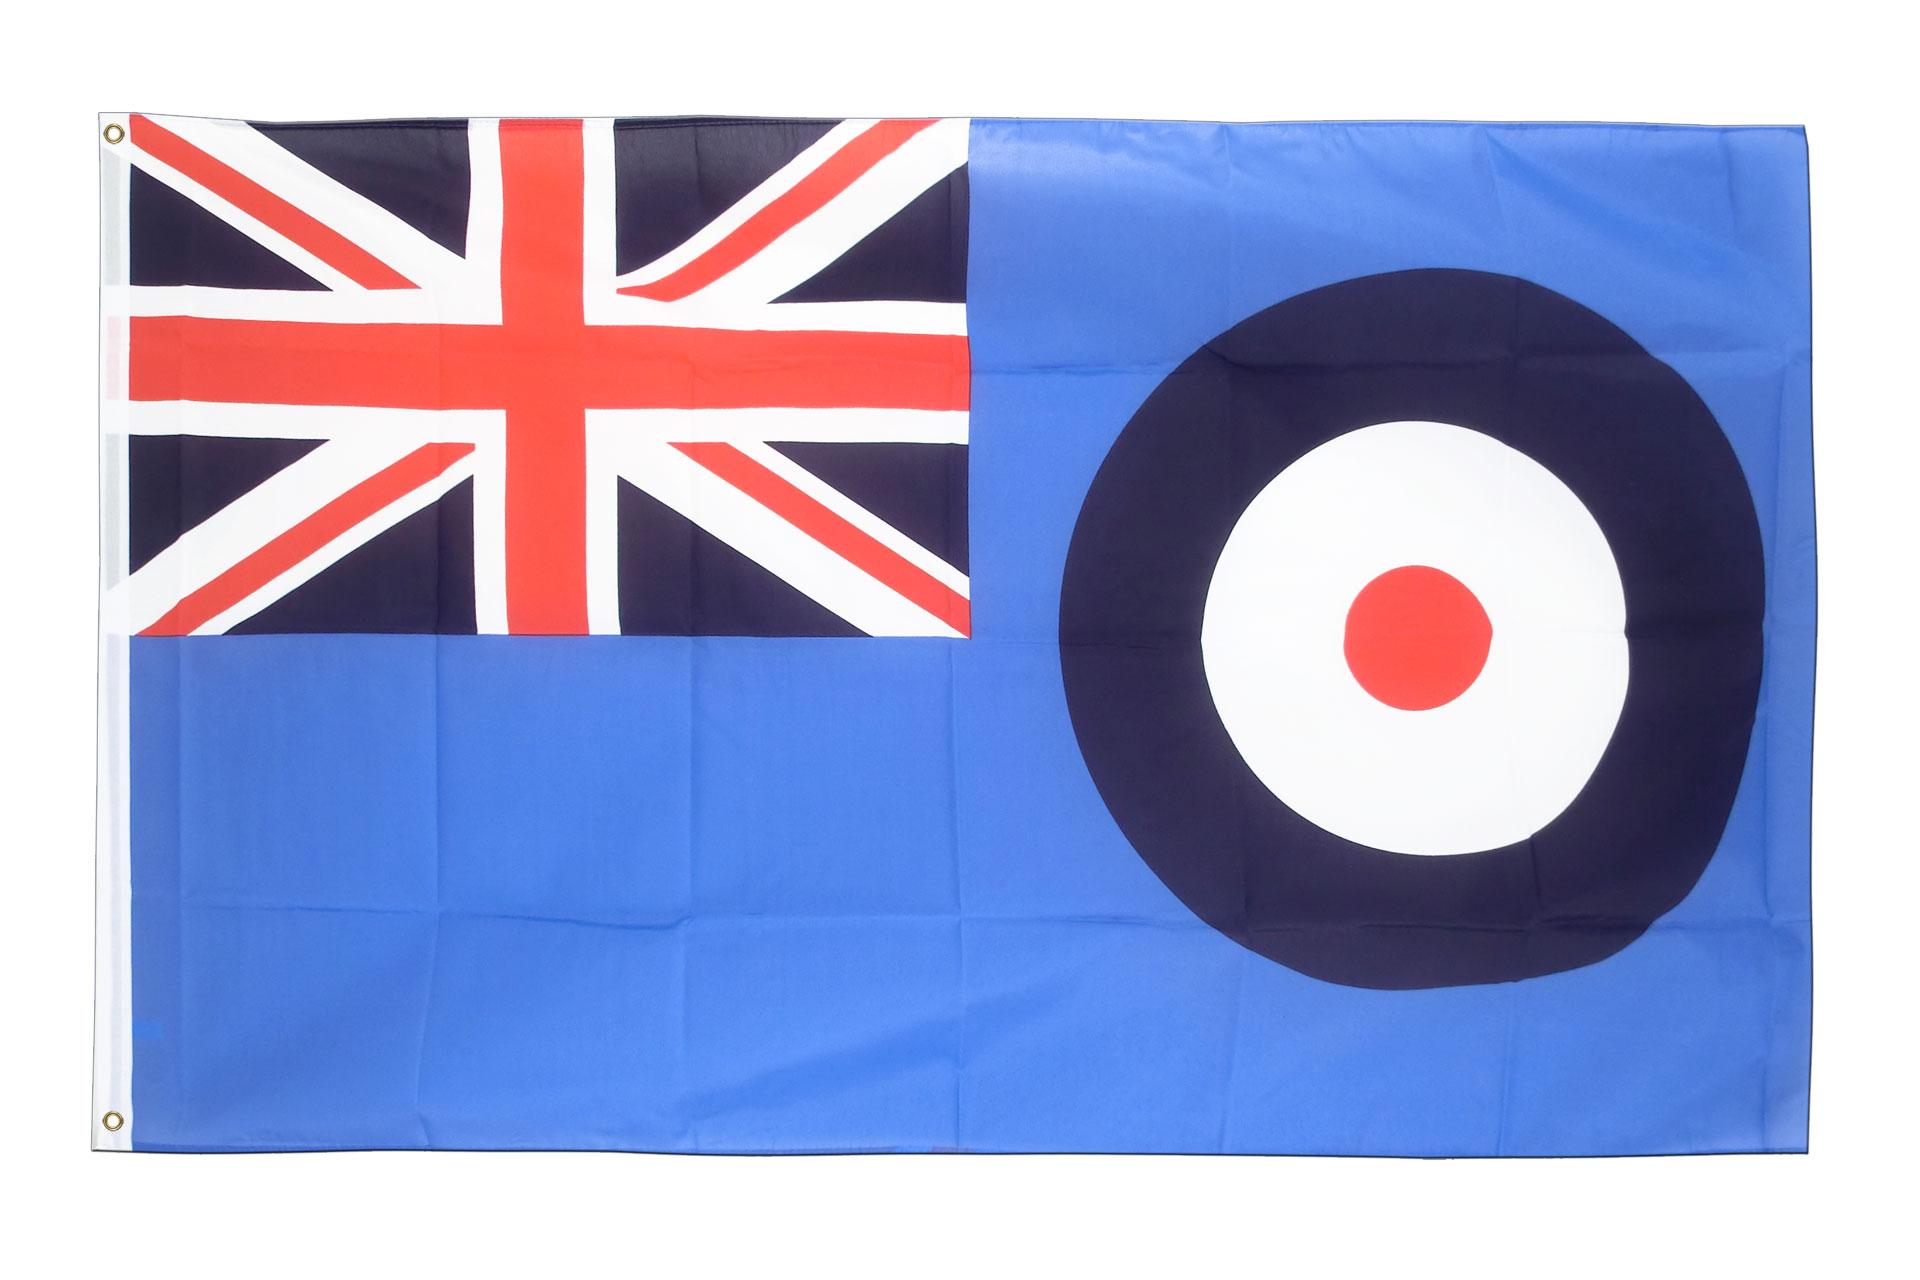 gro britannien royal airforce raf fahne kaufen 90 x 150 cm. Black Bedroom Furniture Sets. Home Design Ideas